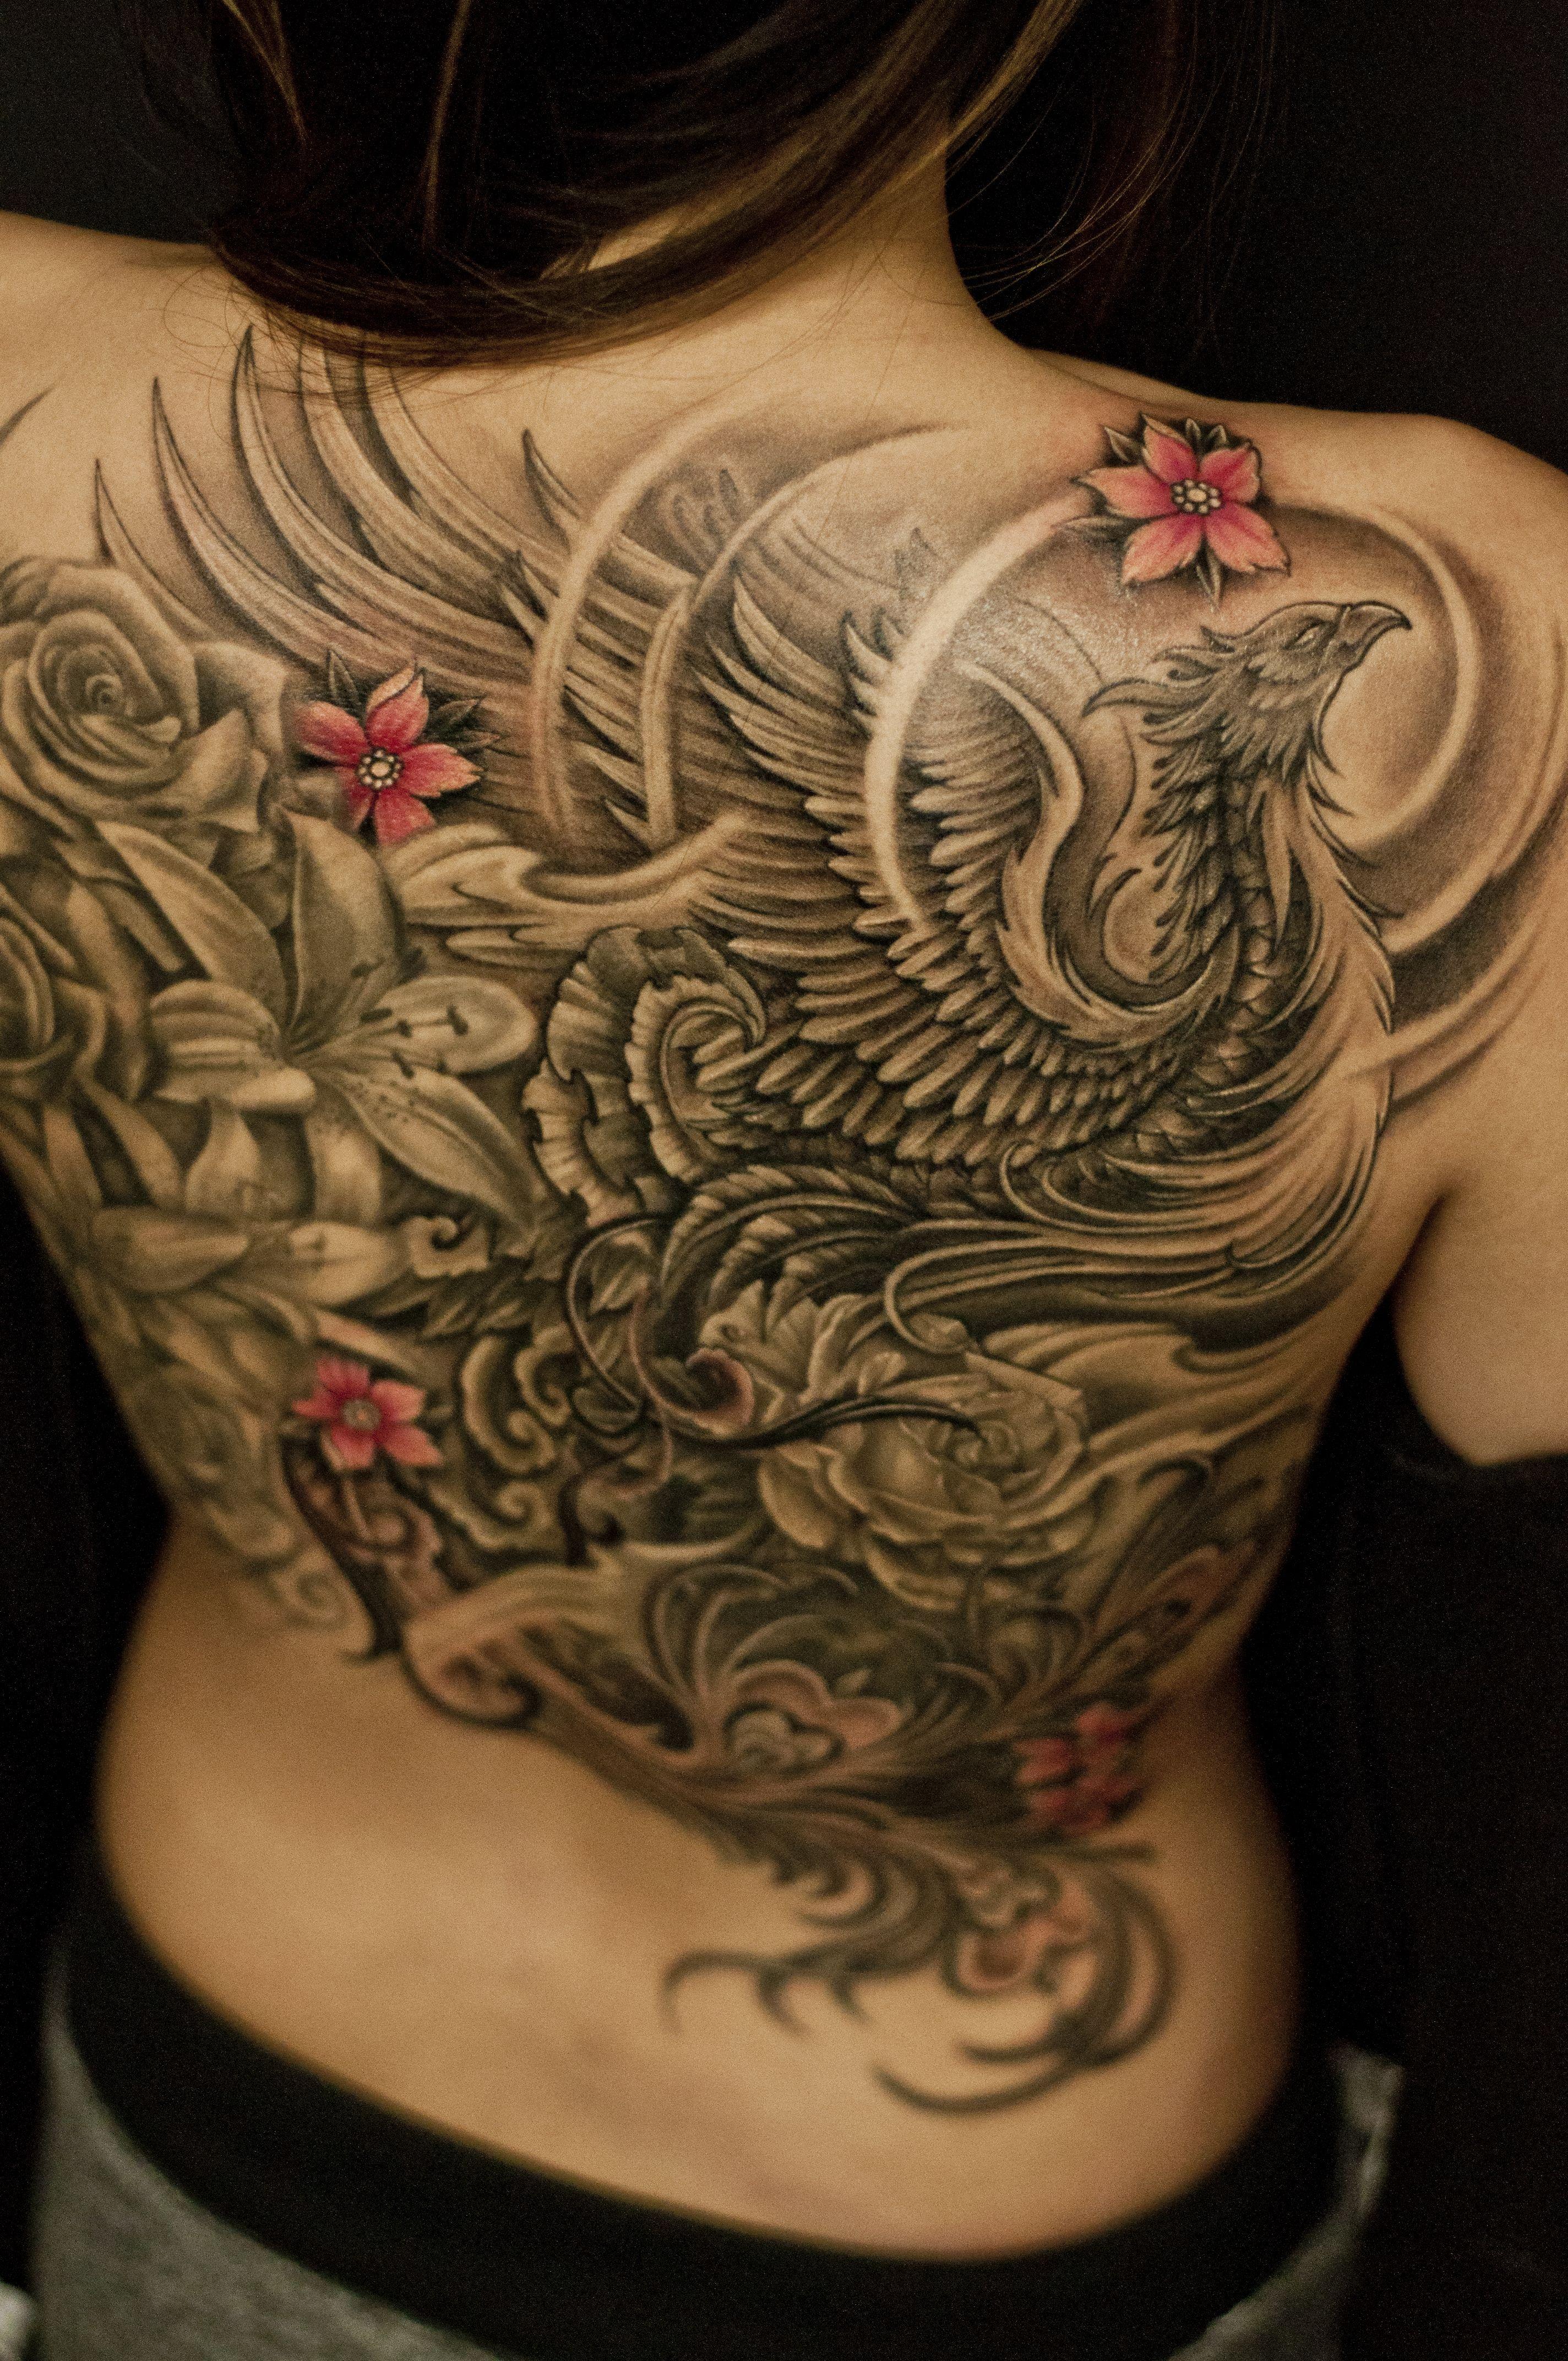 Full Back Black And Grey Phoenix And Flowers Tattoo Jpg 2848 4288 Phoenix Tattoo Phoenix Tattoo Design Phoenix Tattoo Feminine